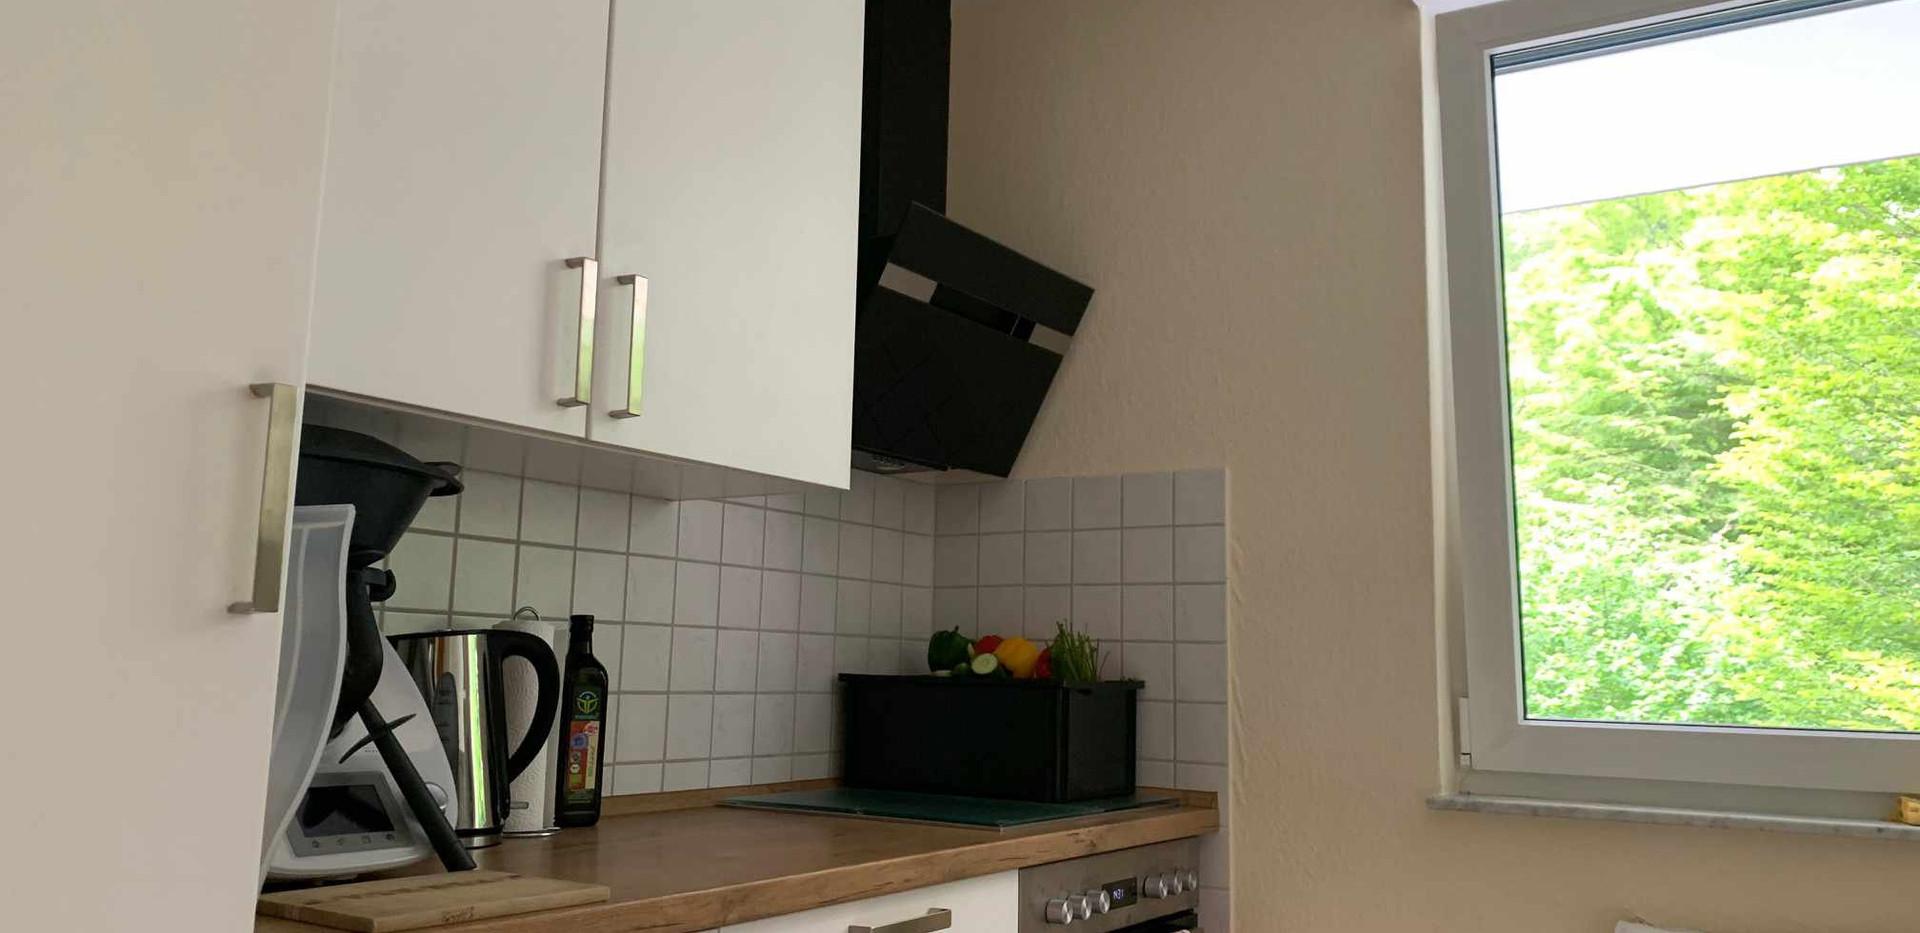 Wohnweisend_Immobilien_Kueche_WVME520HB.